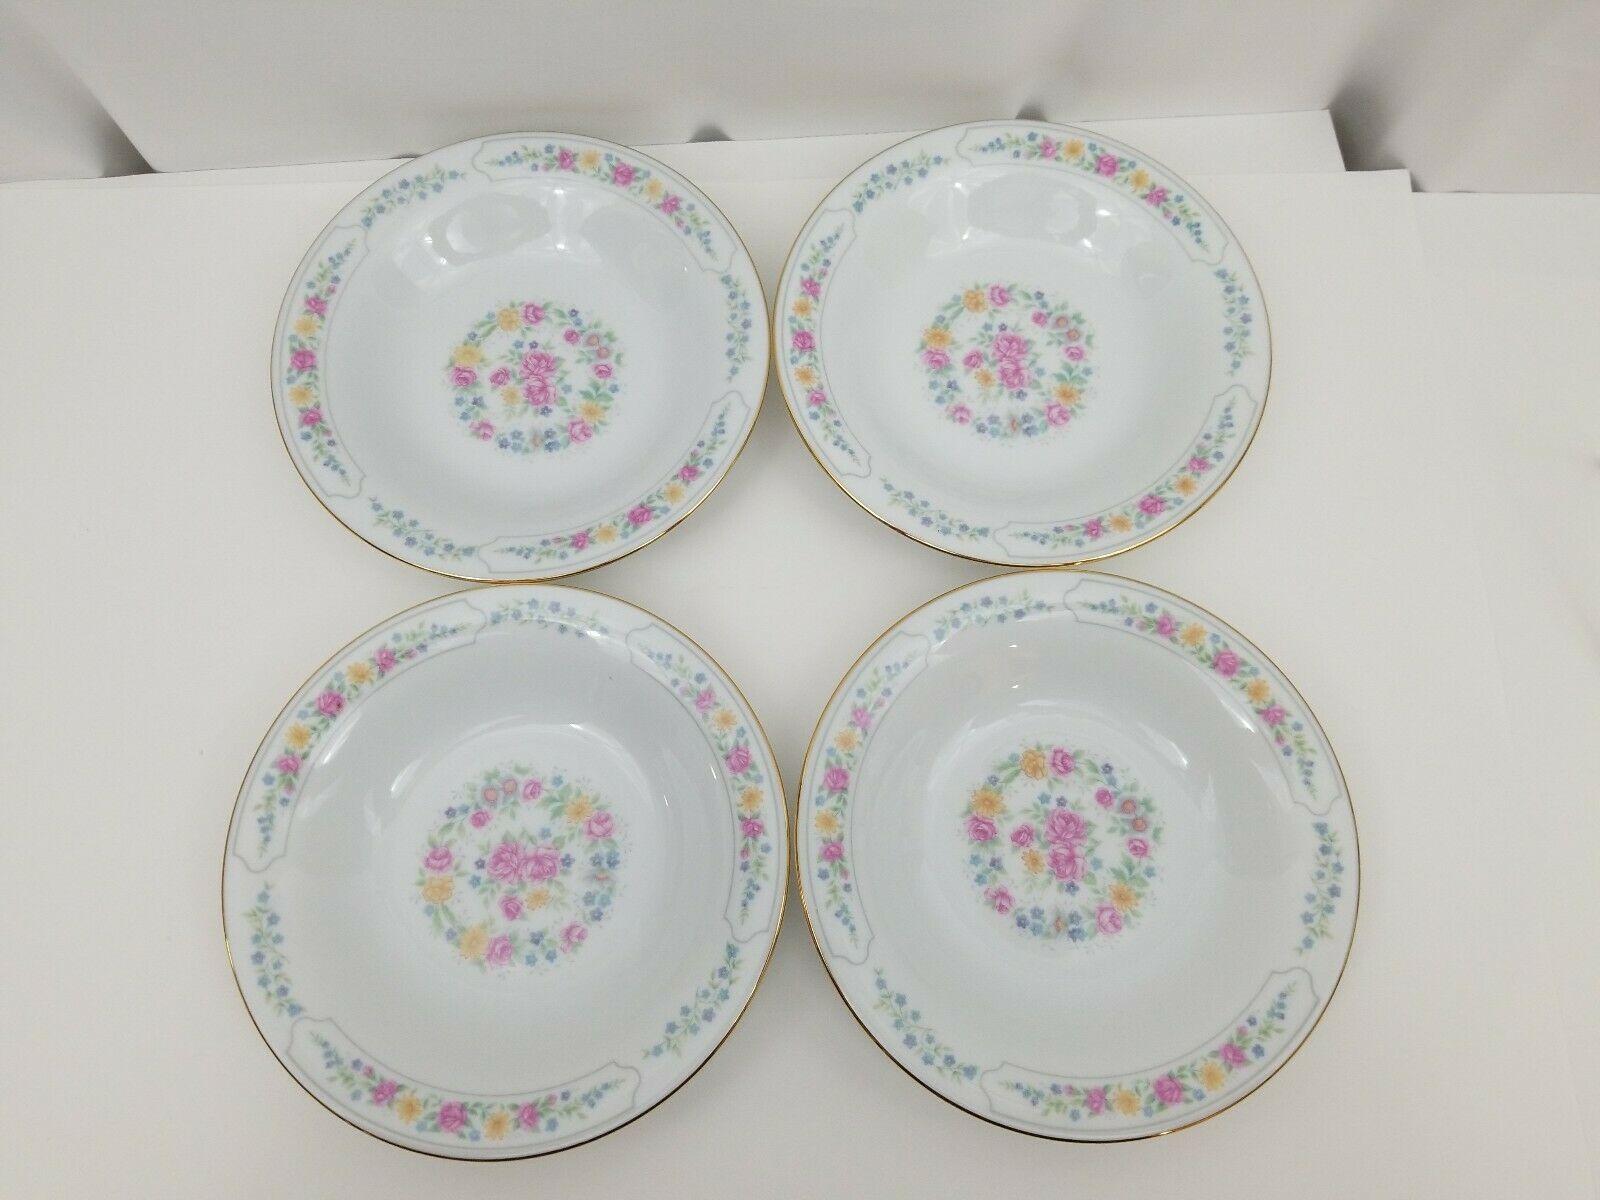 Liling Fine China Cereal Soup Bowls Set of 4 Yung Shen White Roses Keepsake 8.25